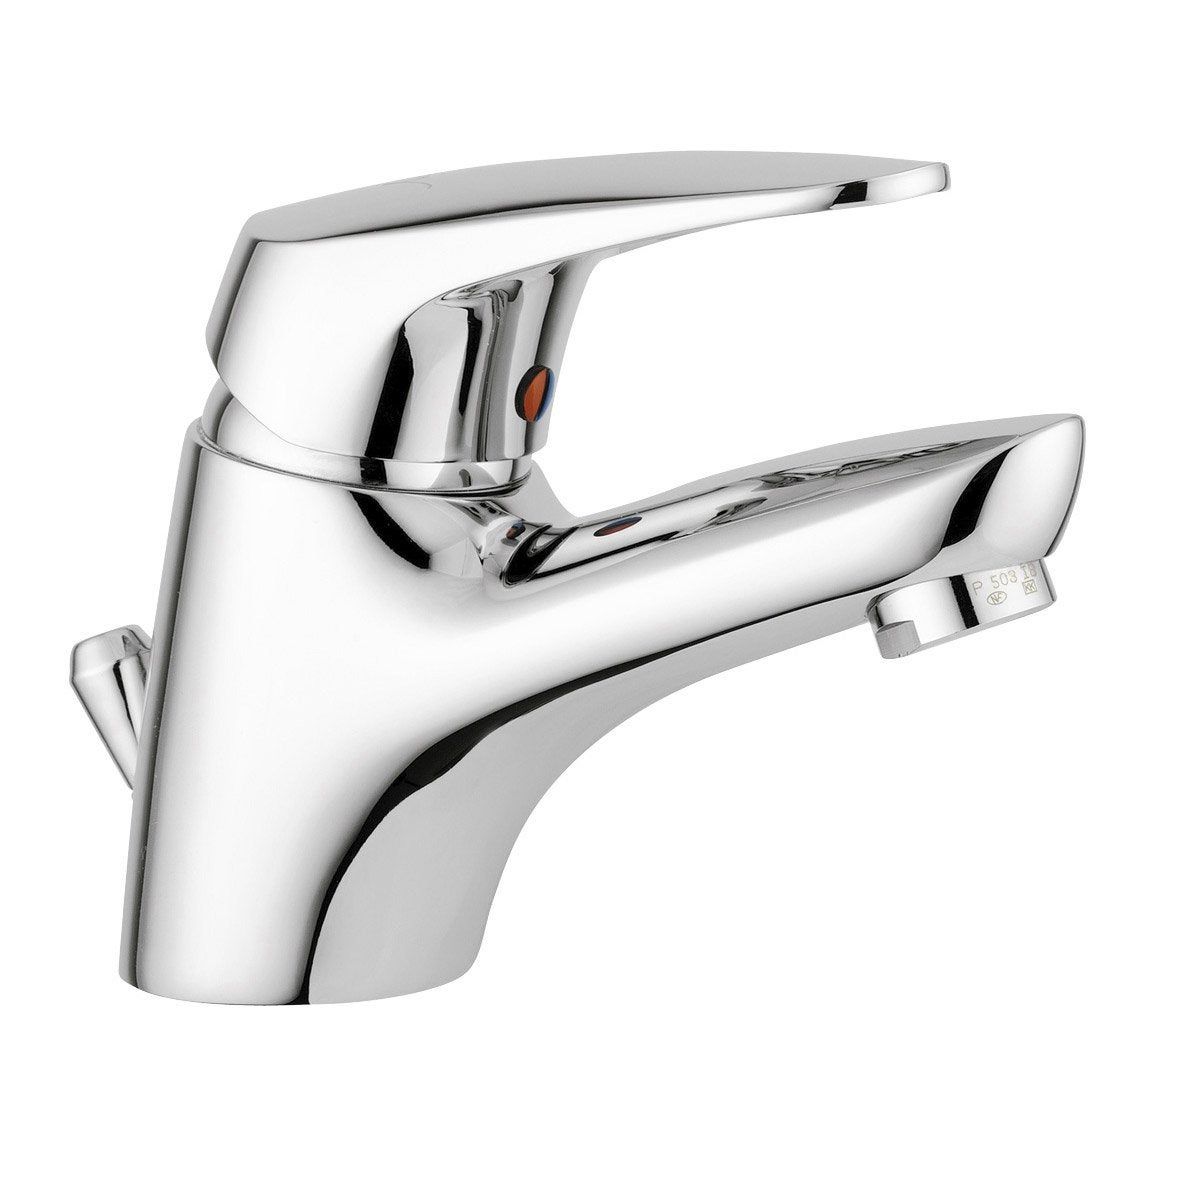 Changer un robinet de lavabo leroy merlin